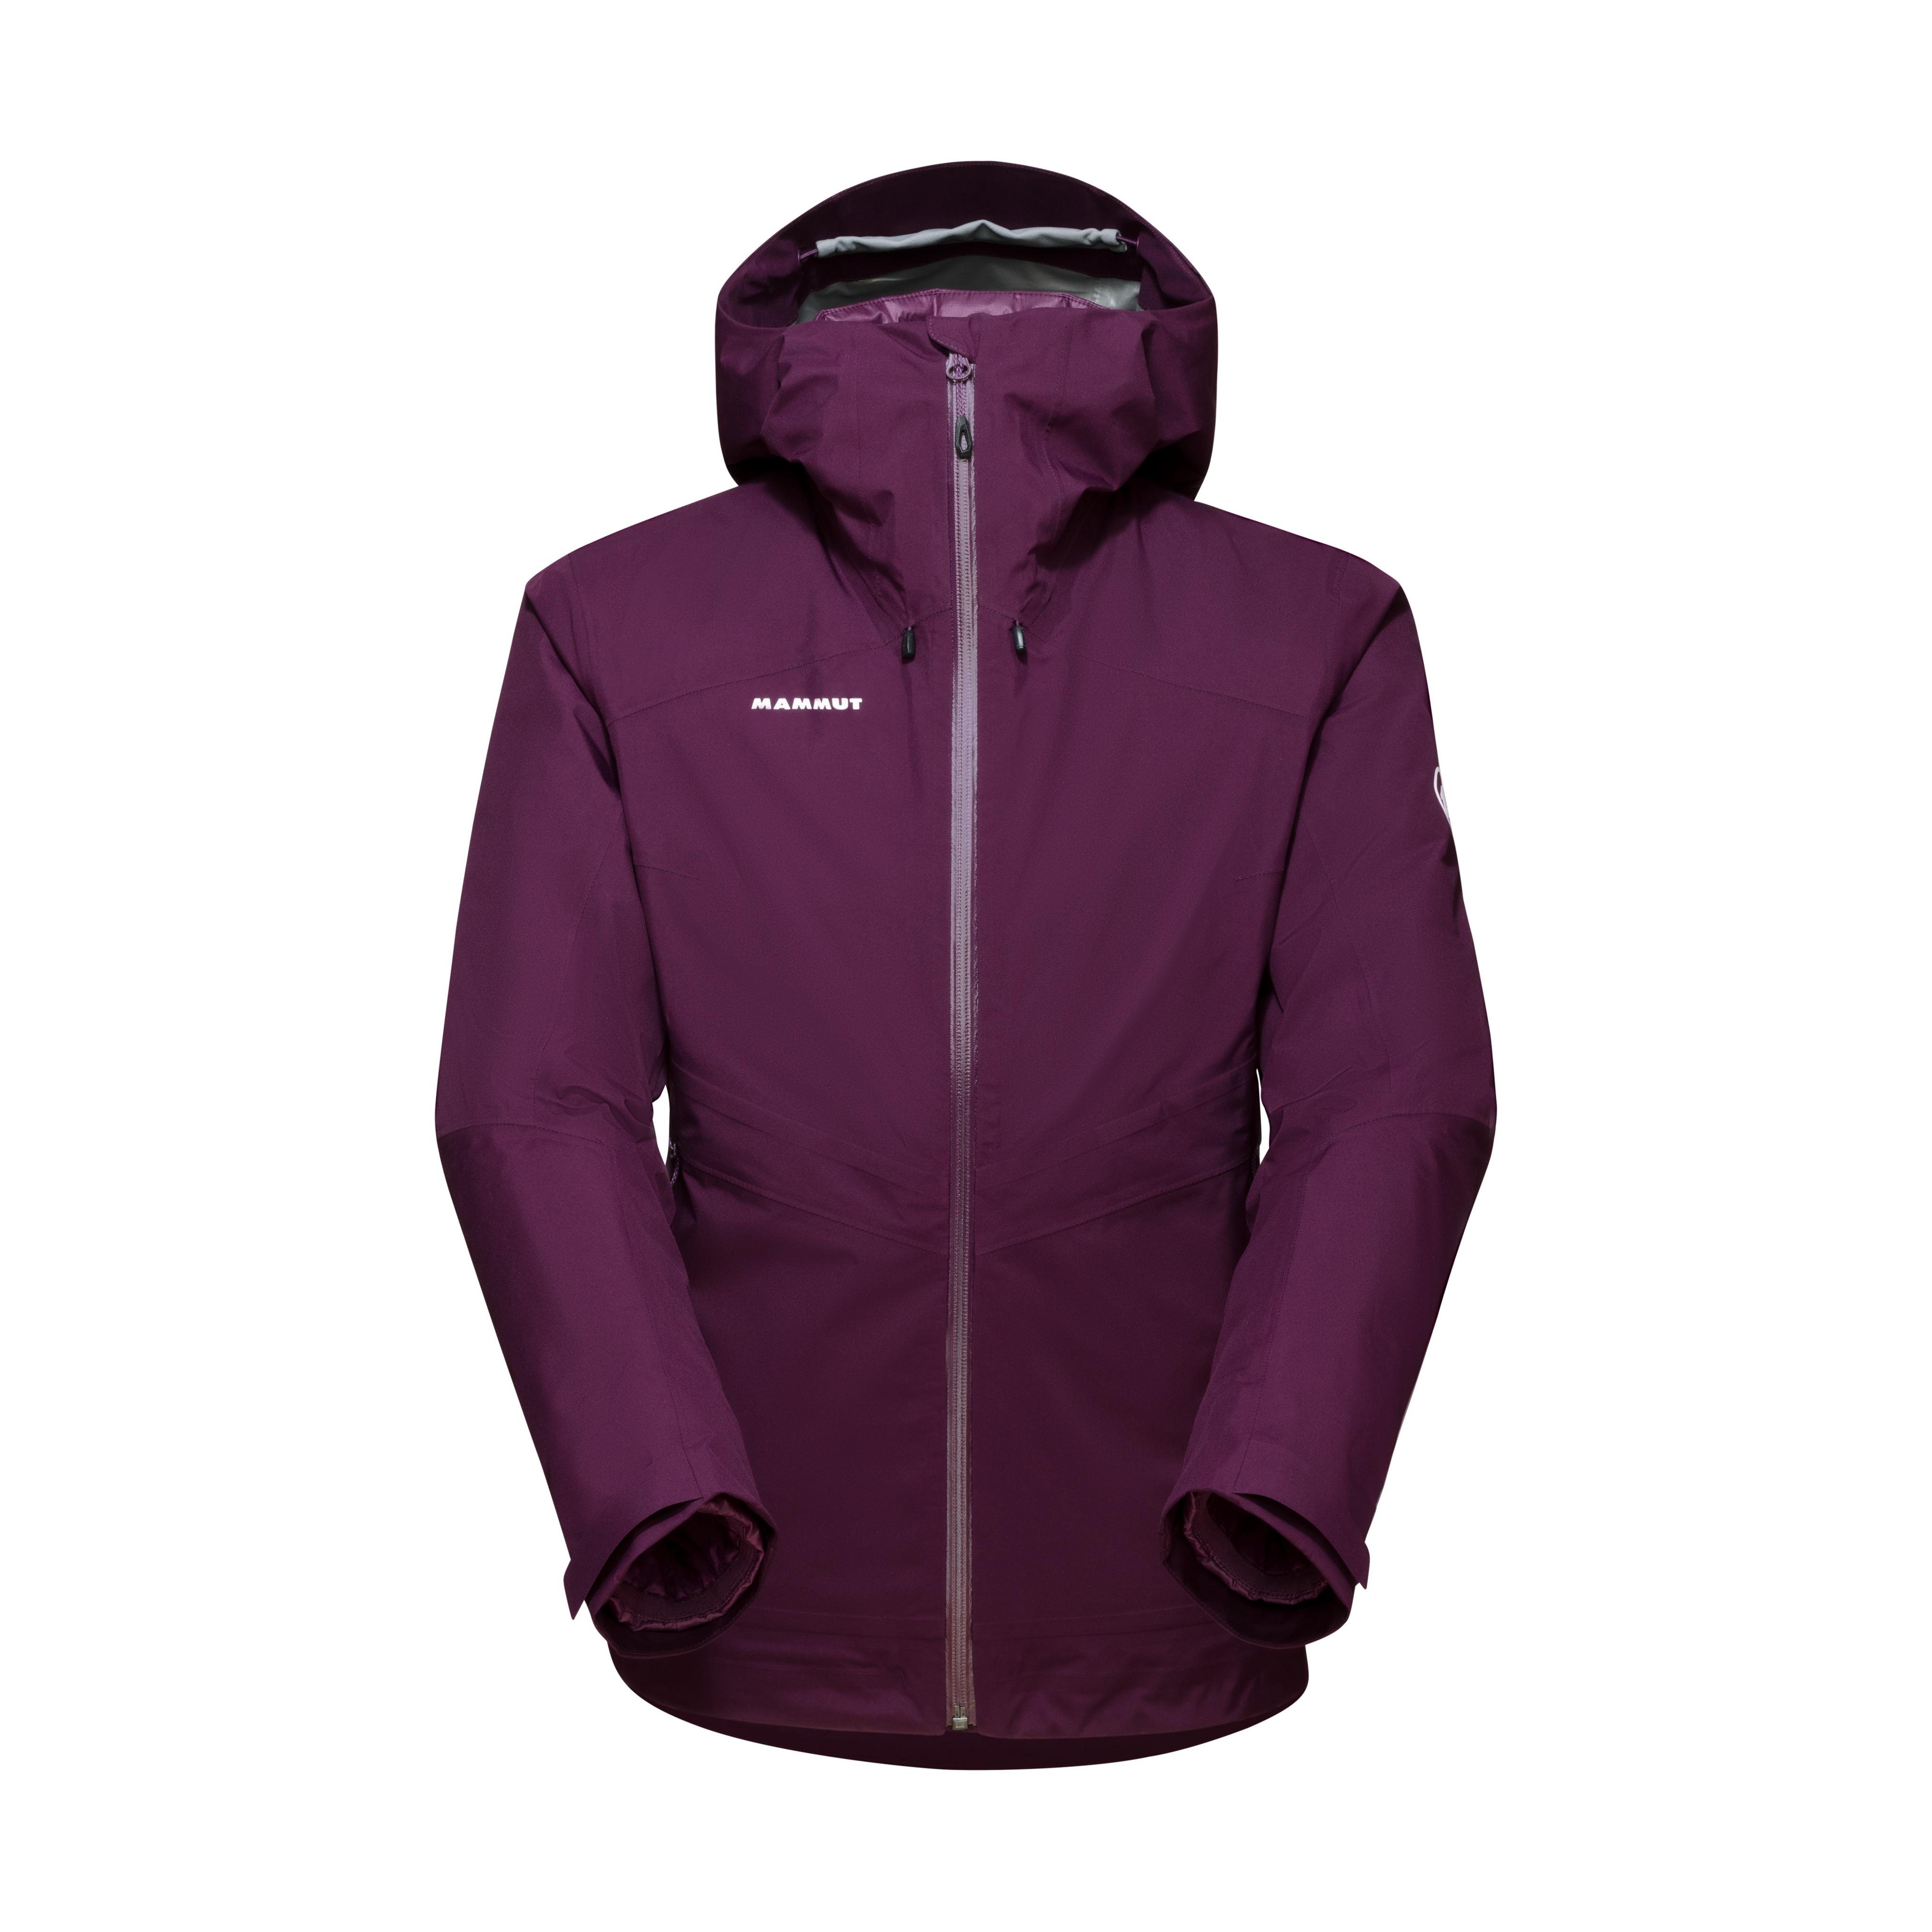 Convey 3 in 1 HS Hooded Jacket Women - grape-grape, XS thumbnail